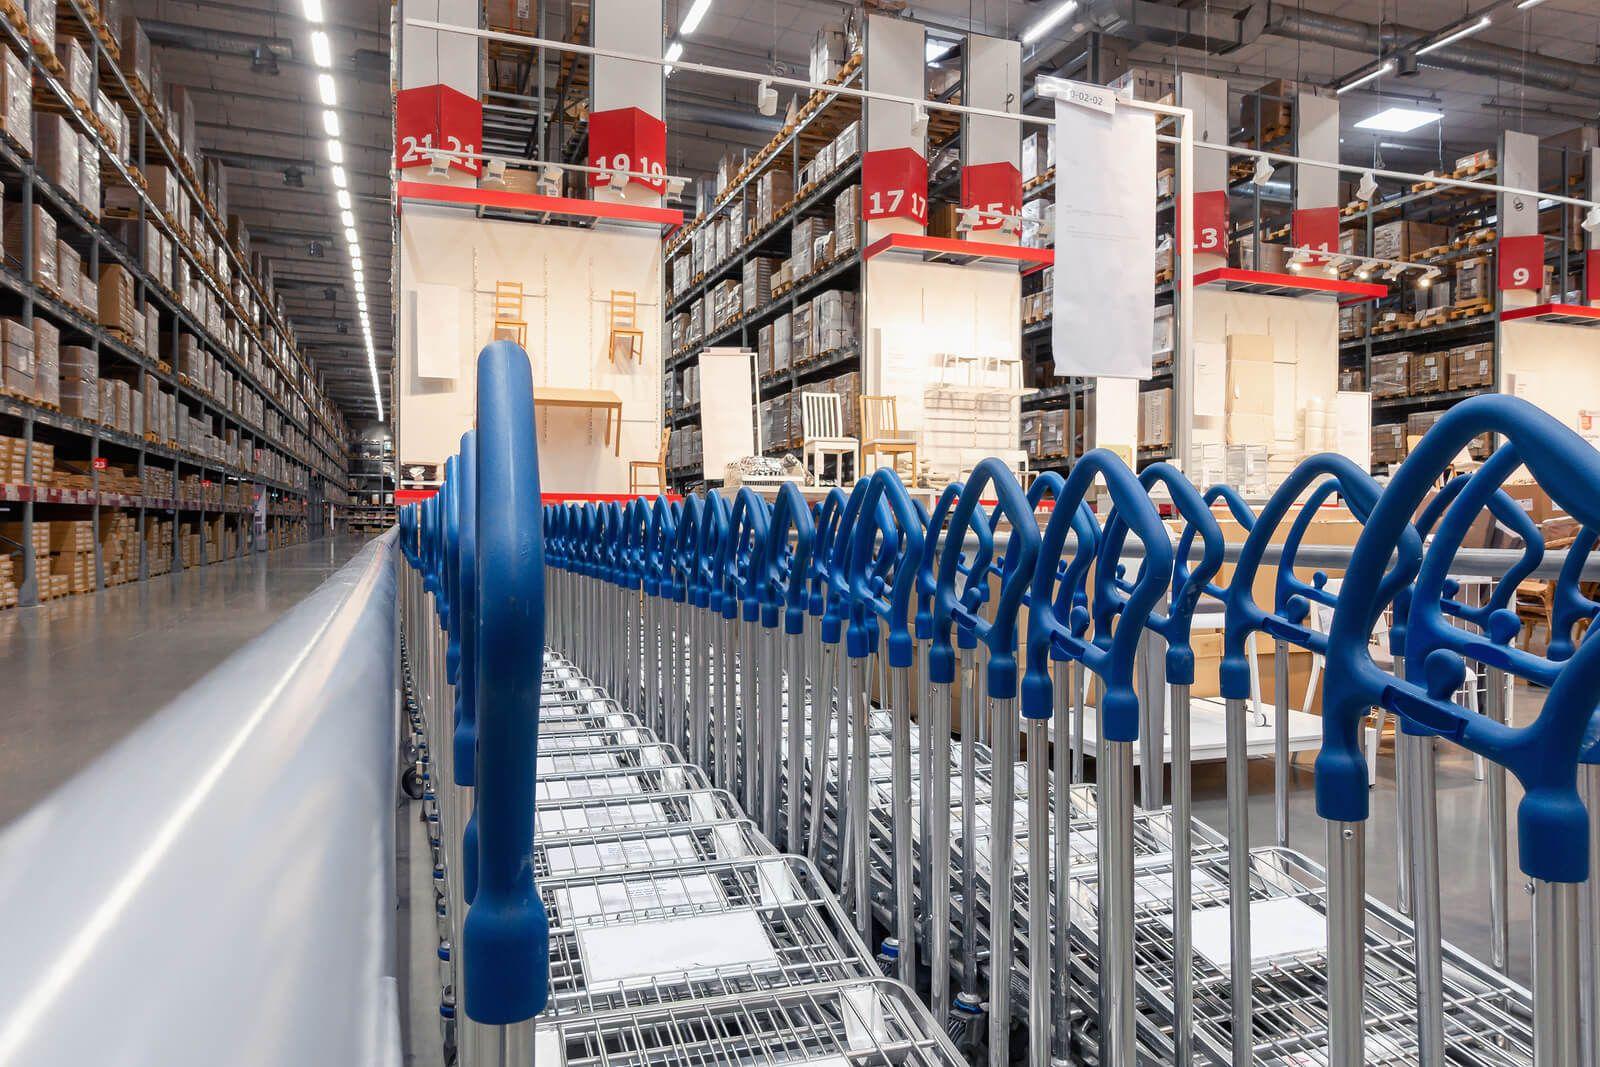 bigstock-Shopping-Cart-On-Corridor-Floo-322747858